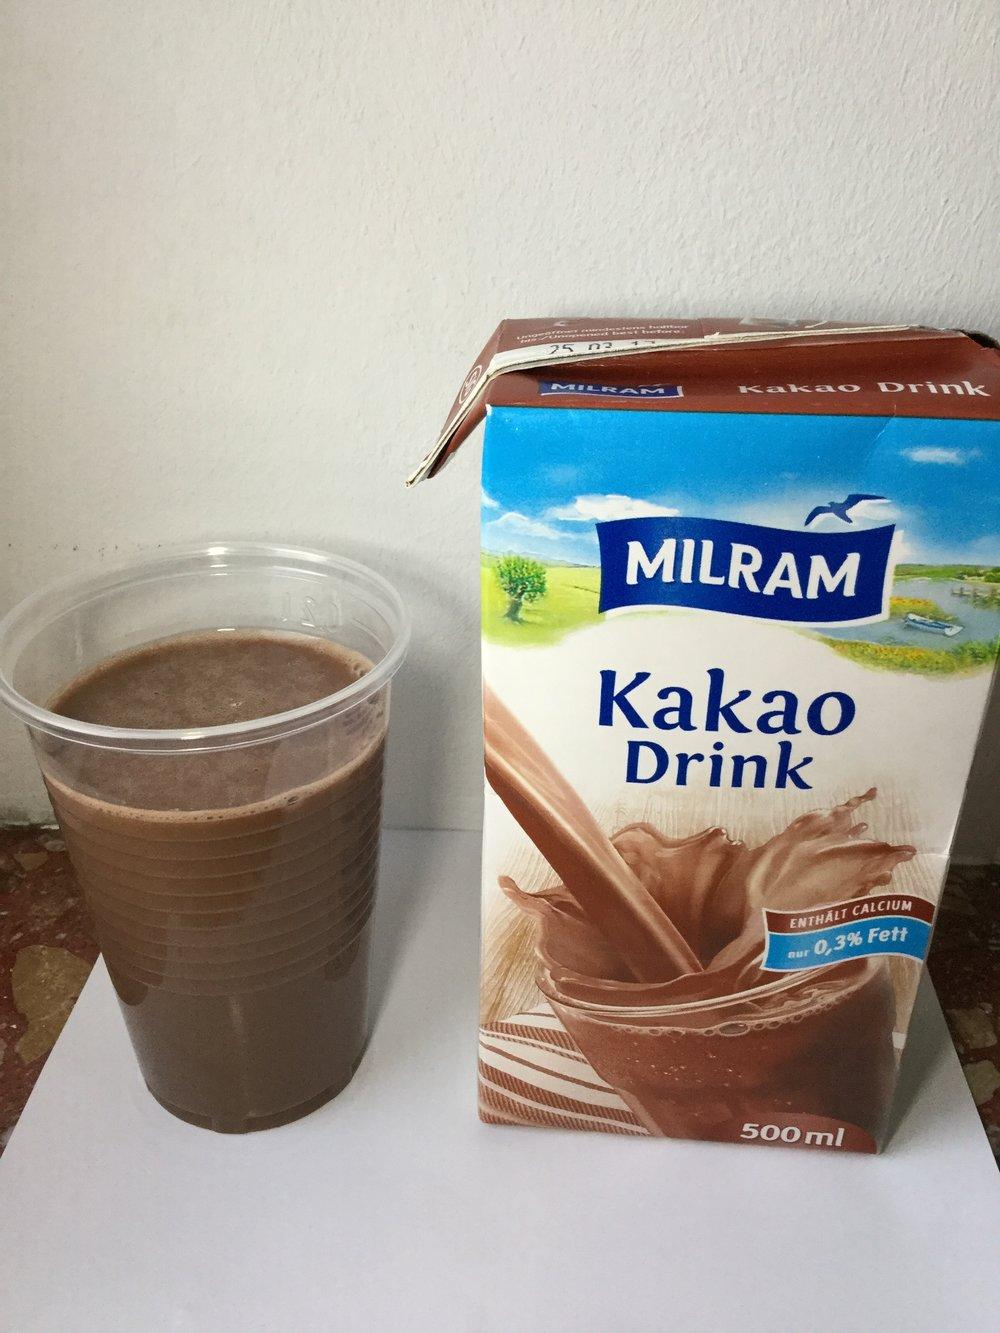 Milram Kakao Drink Cup